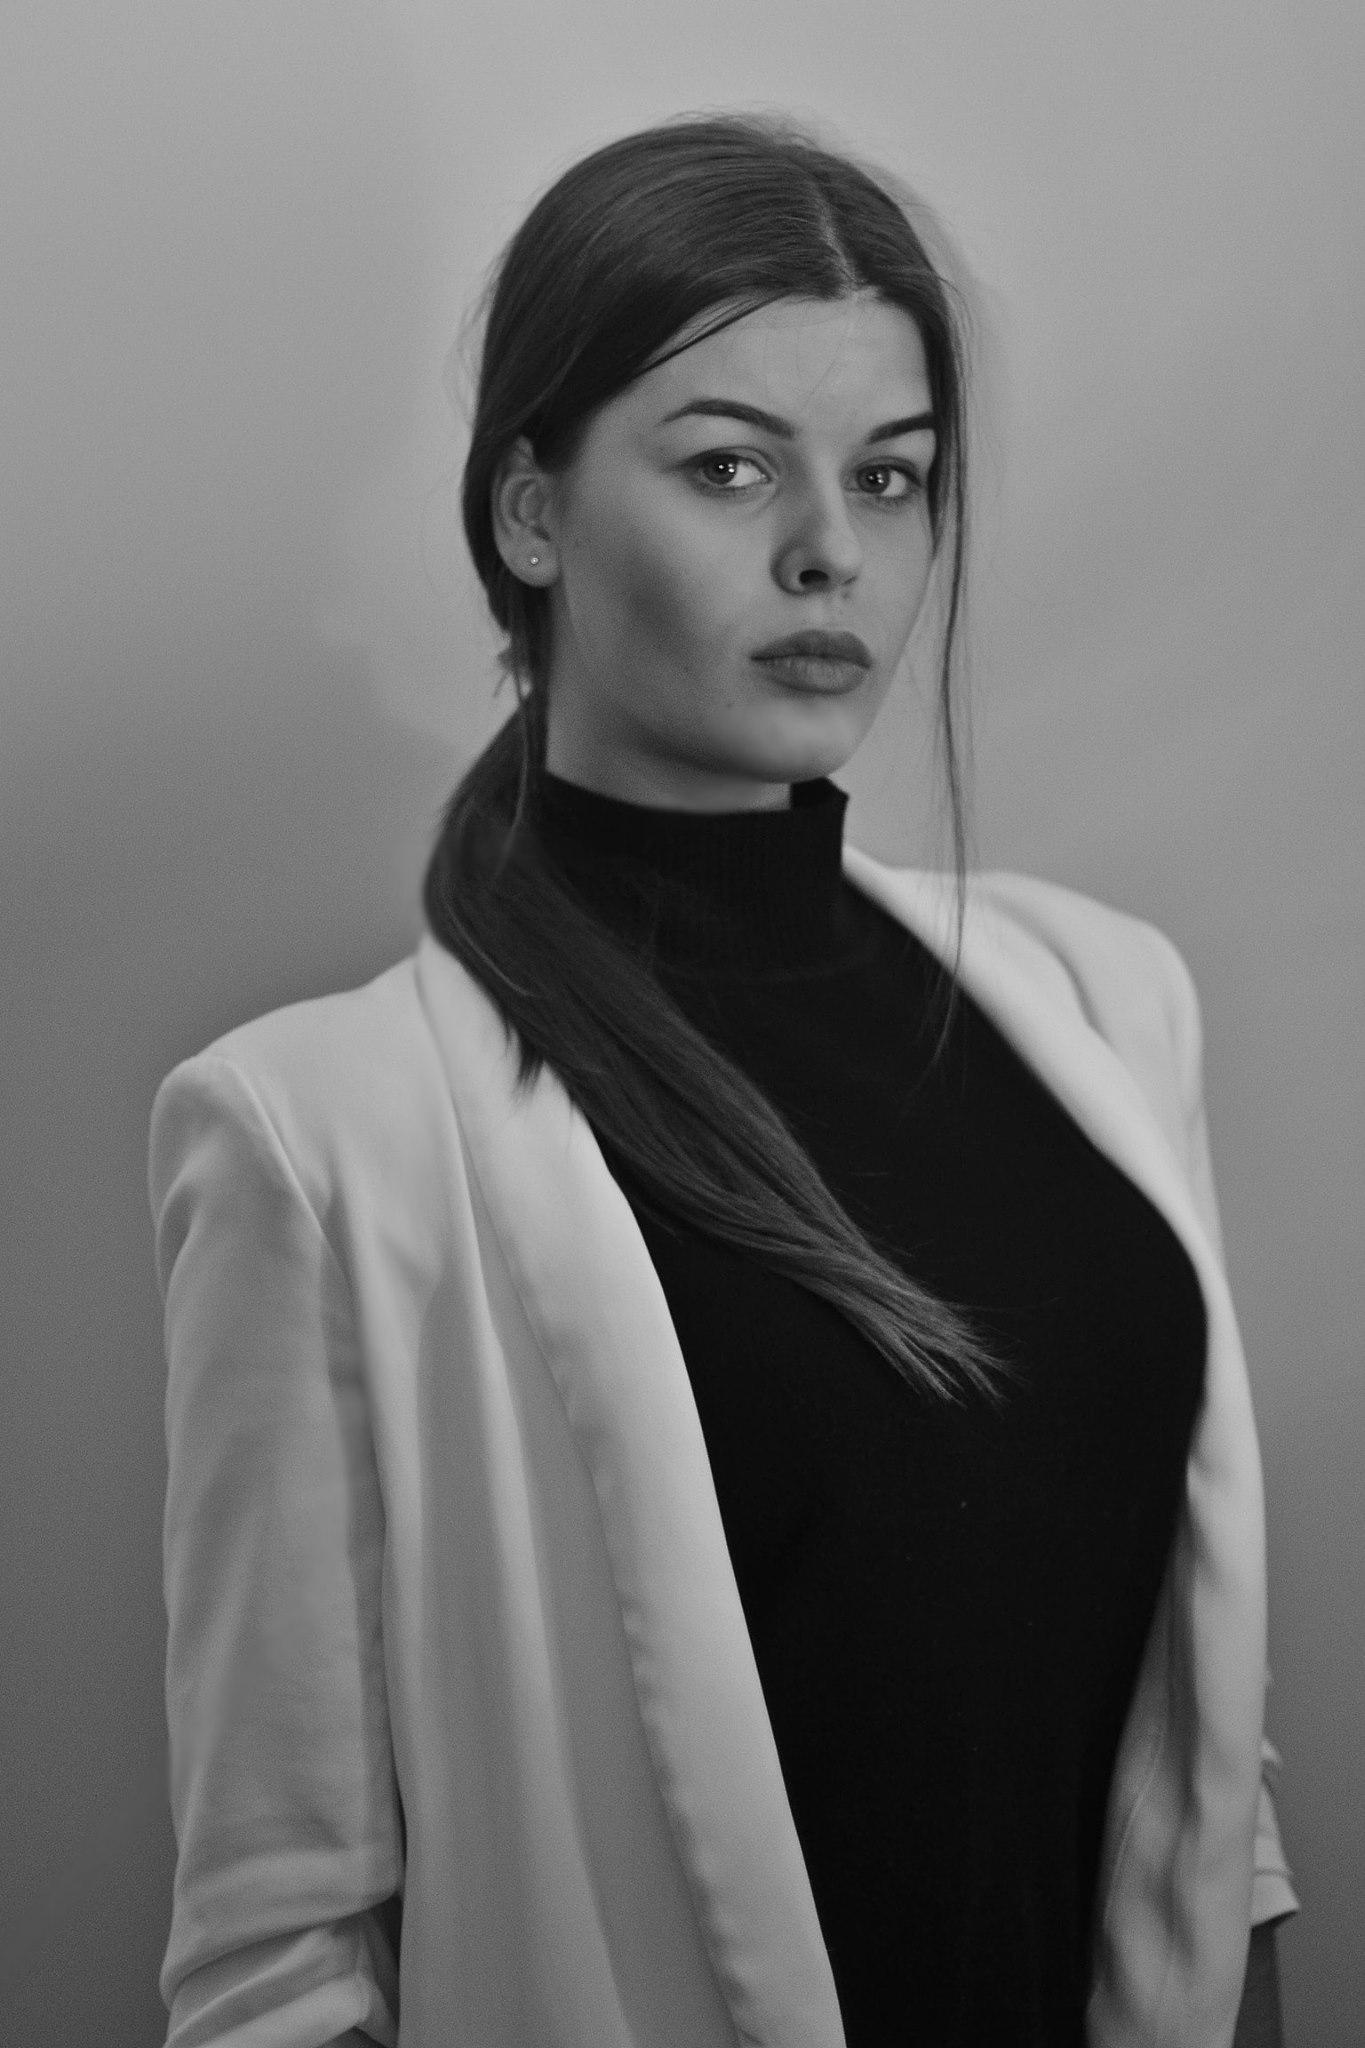 Aleksandra_16-4